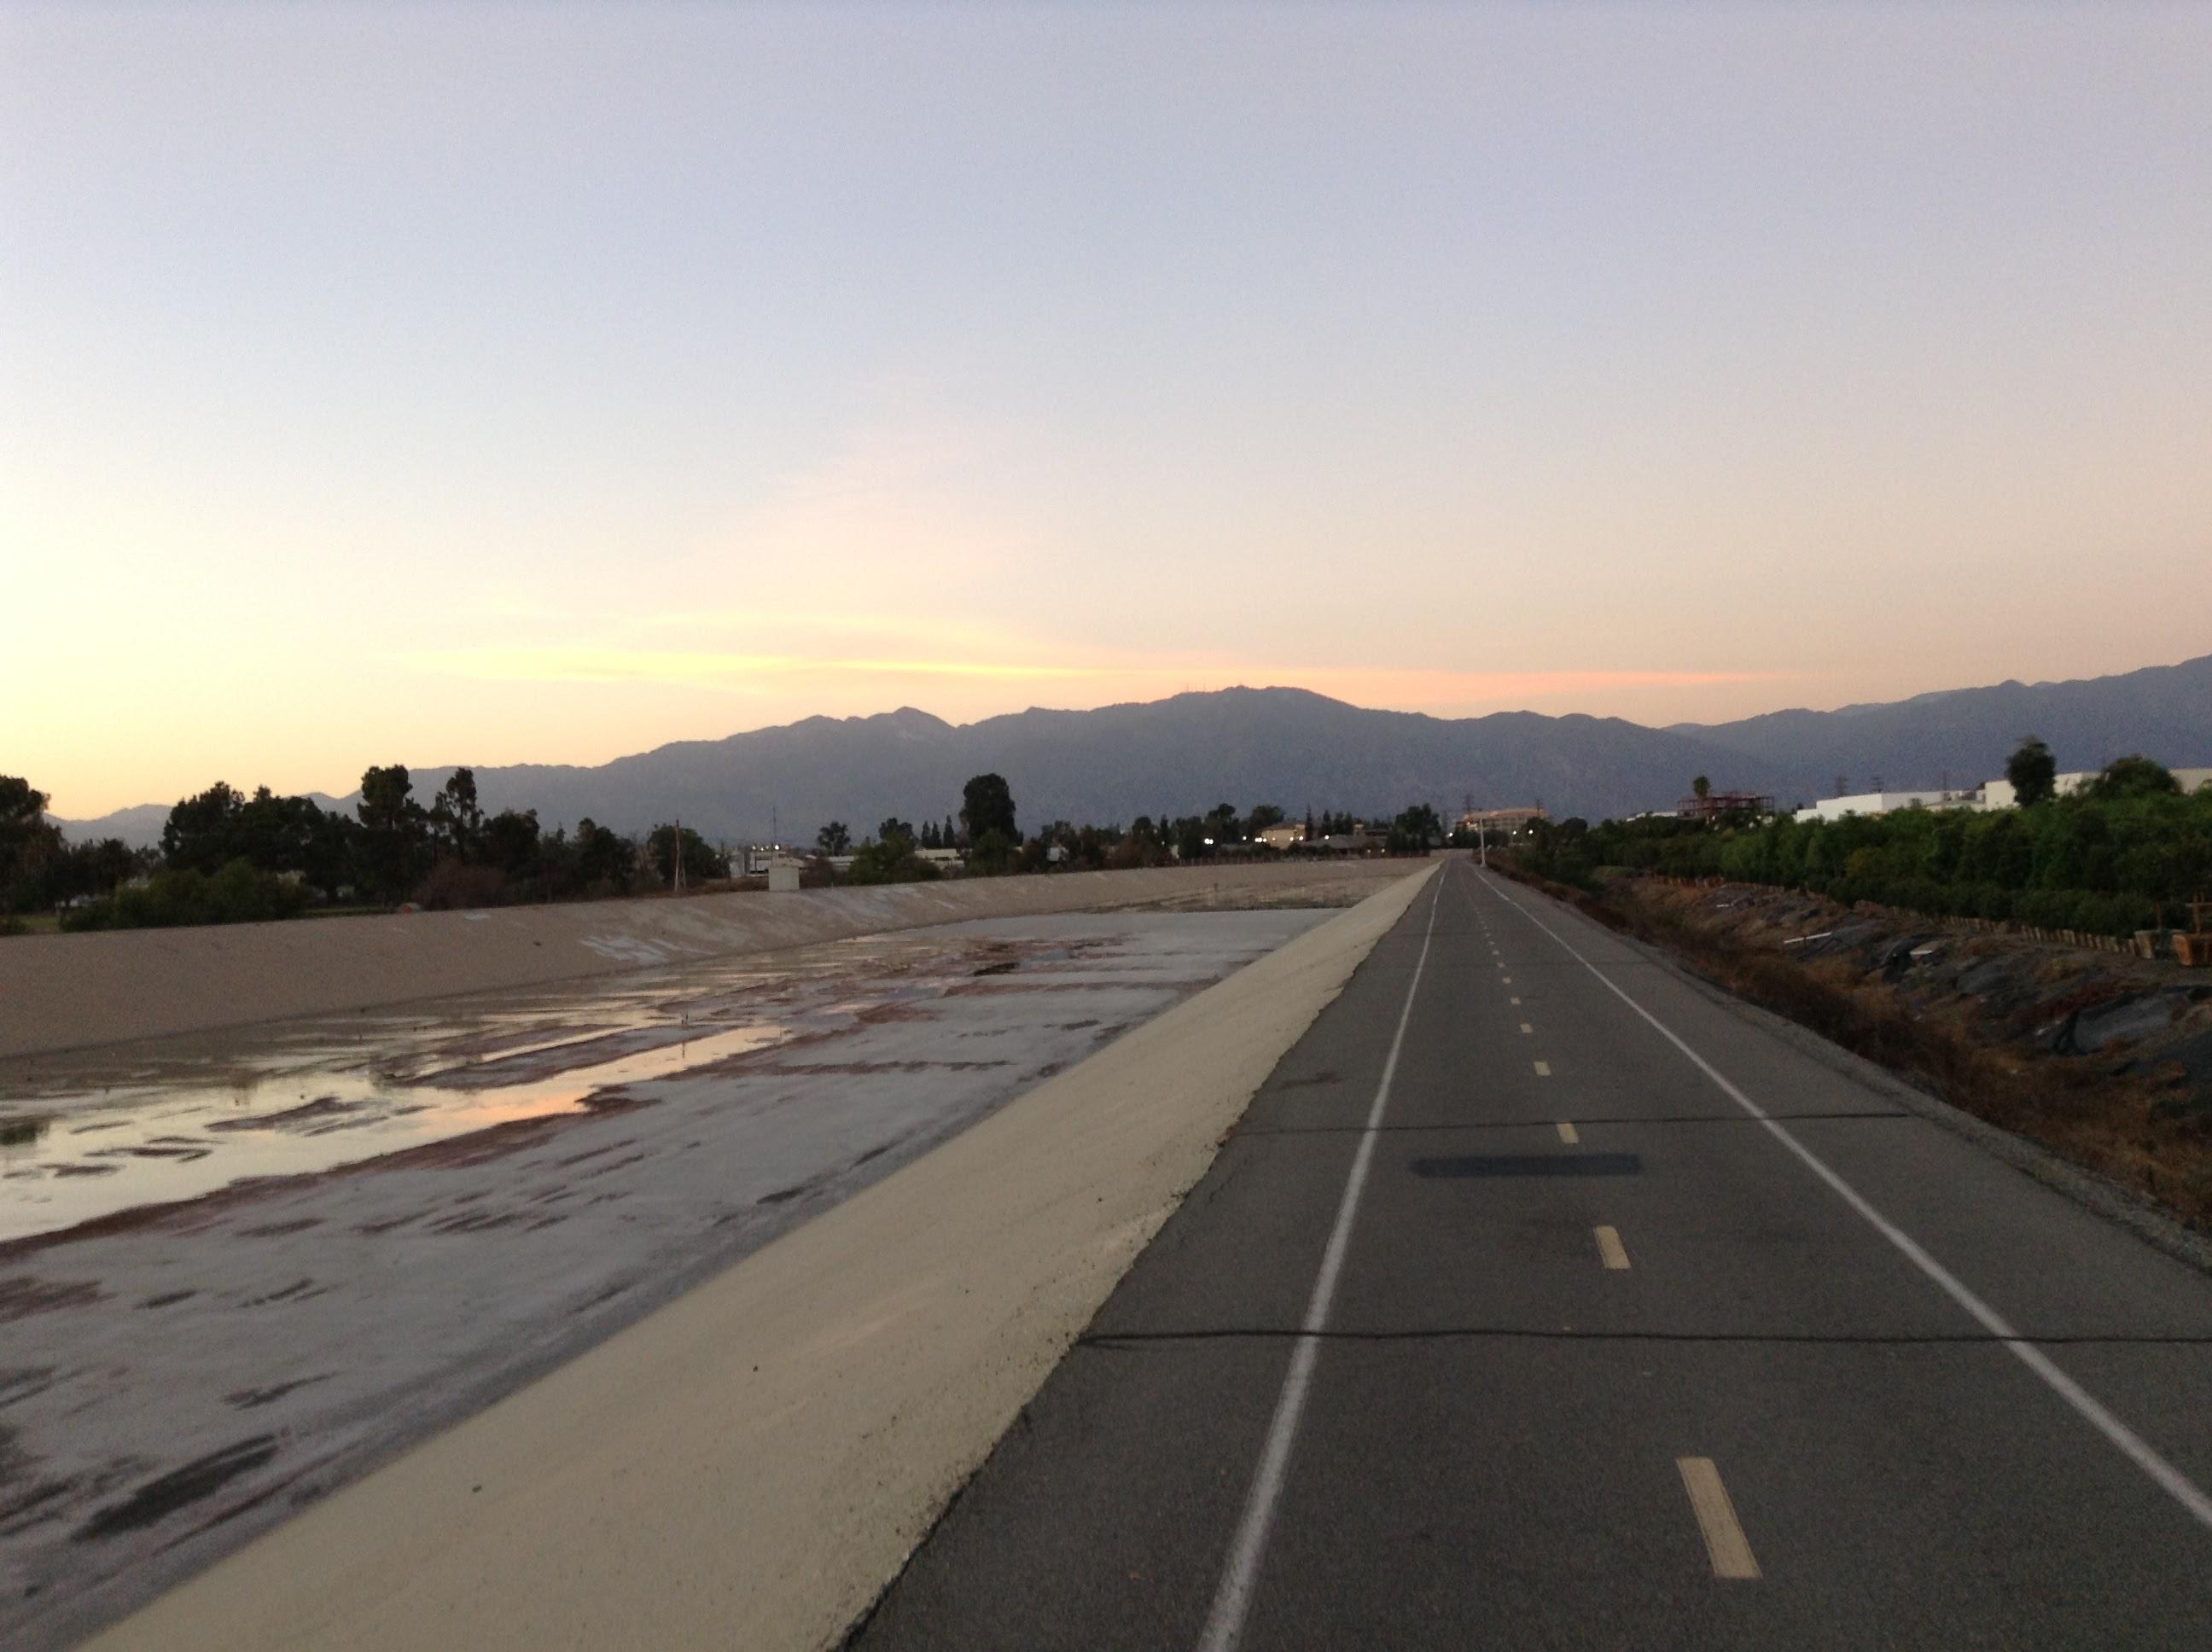 Friday 4 Nov '16 – River Trail: 2.55 miles